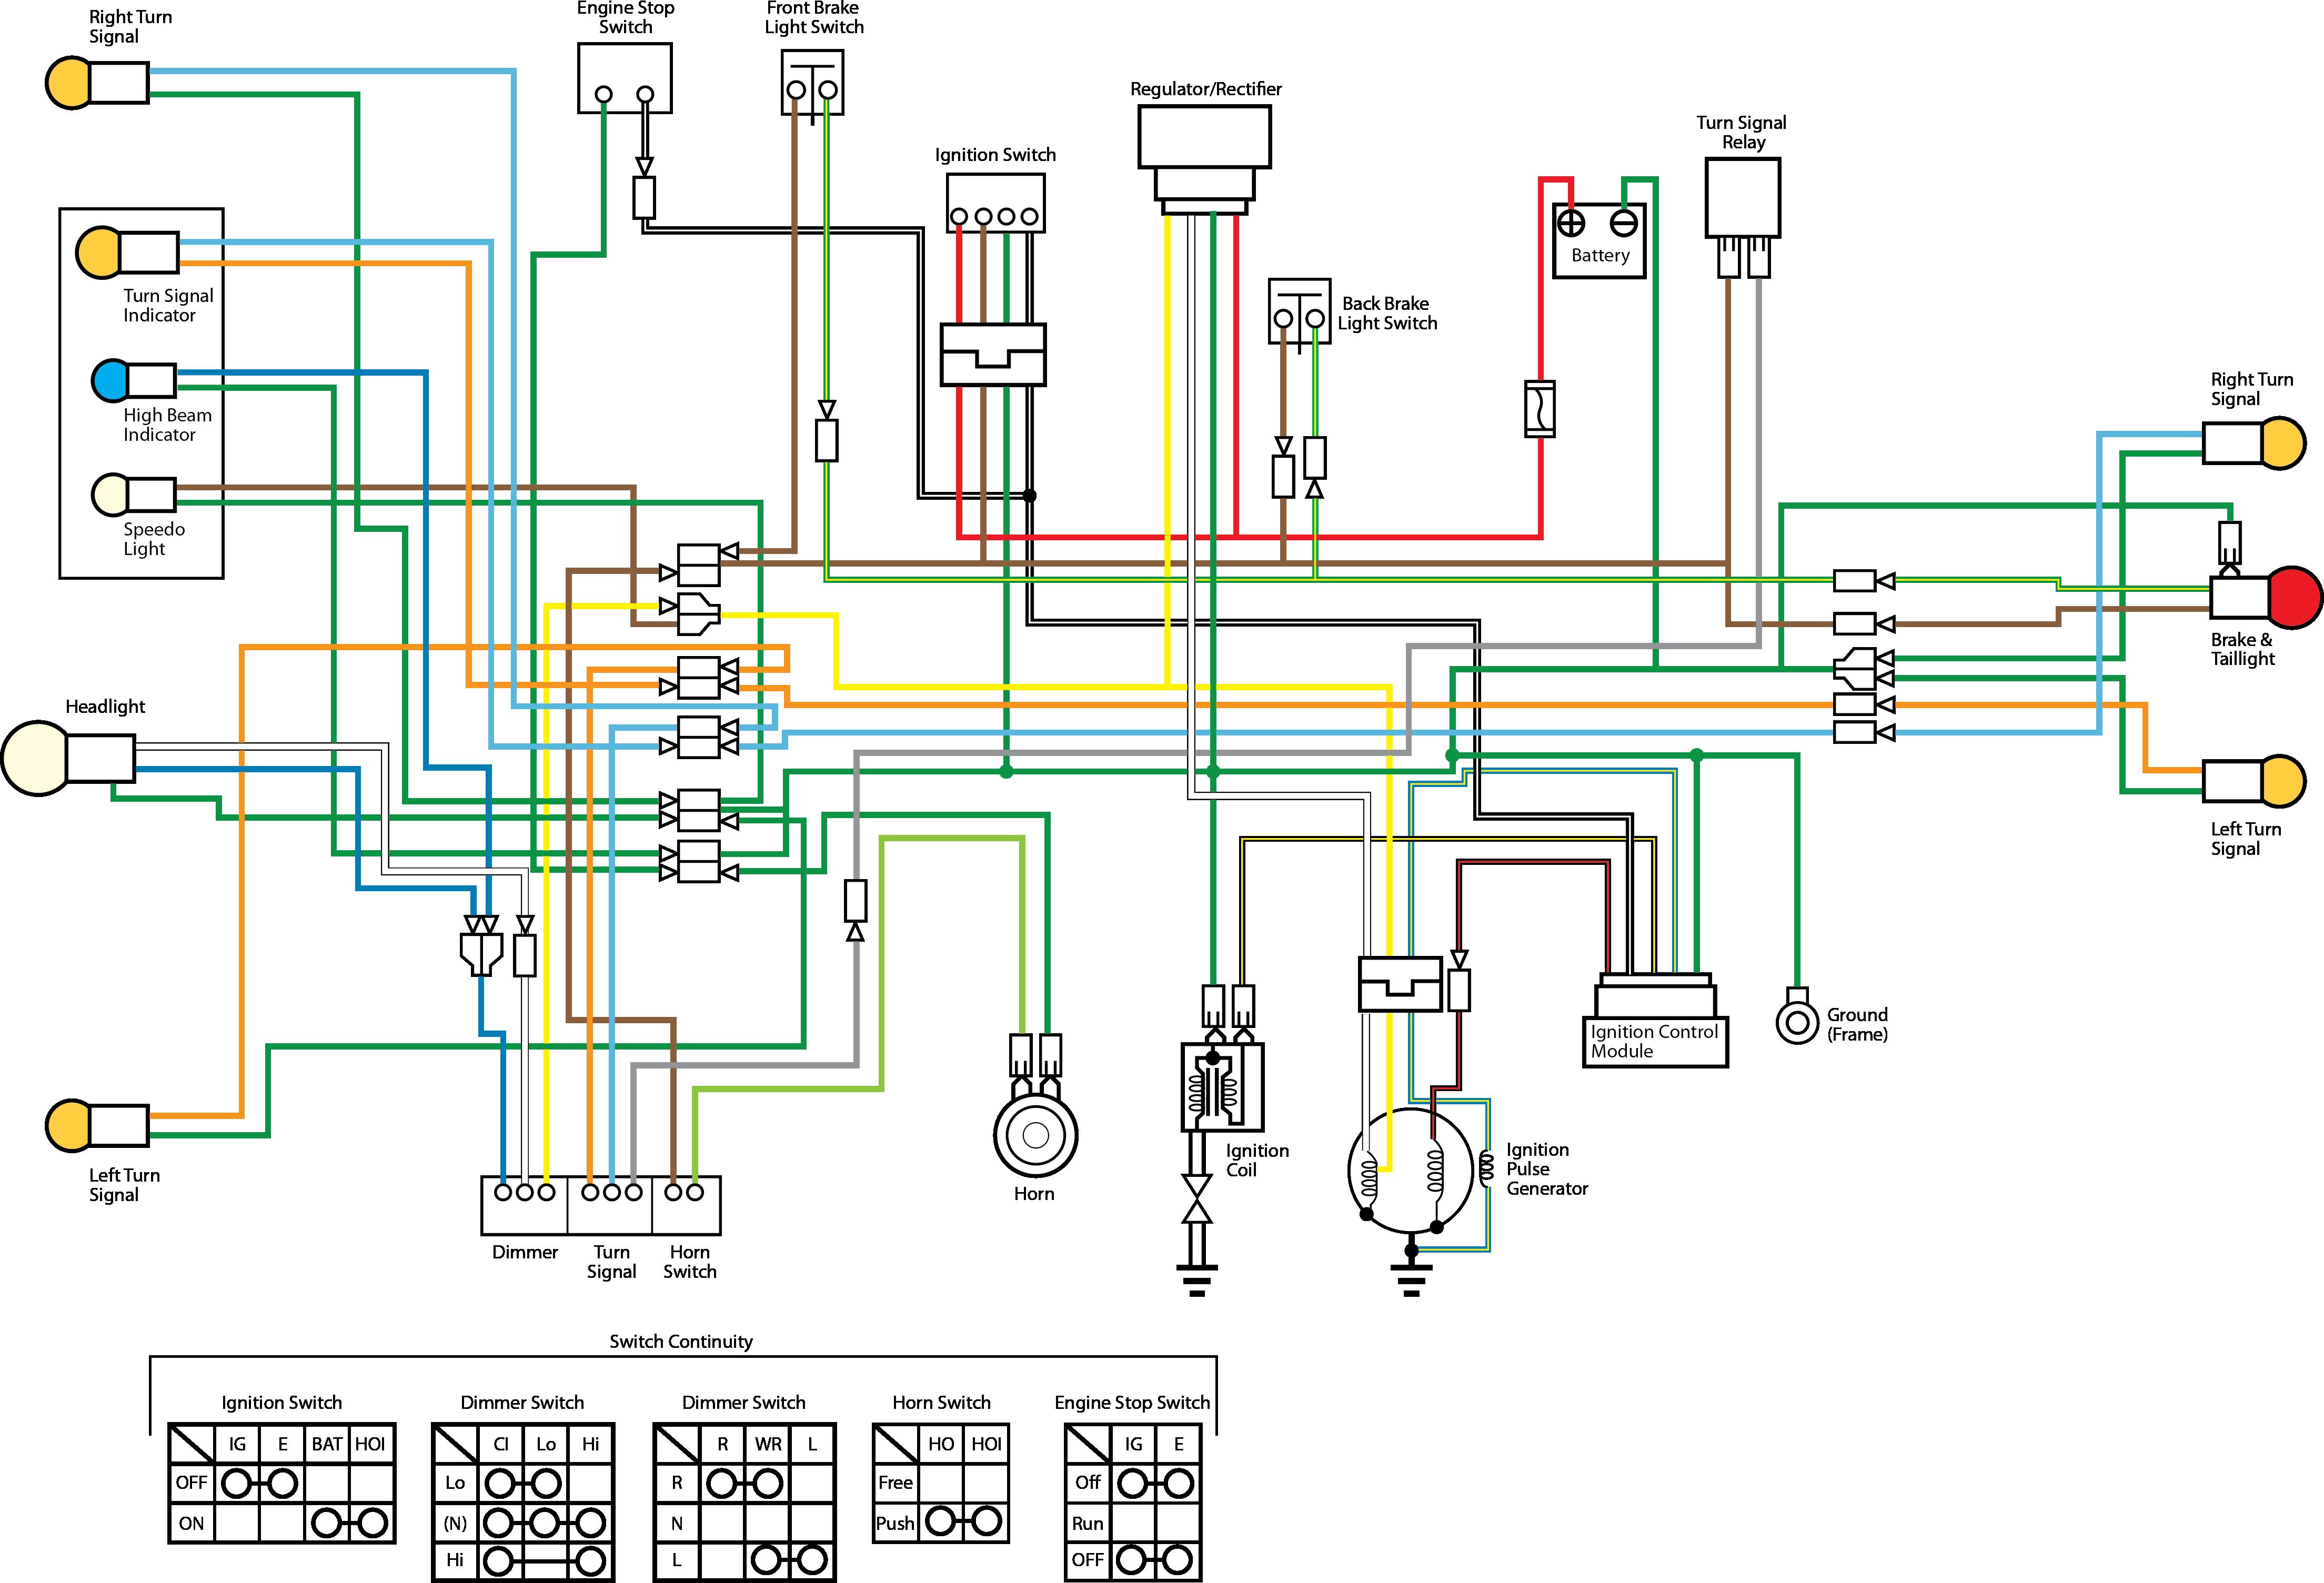 The Best 20 Create Wiring Diagram Online Samples Electrical Wiring Diagram Electrical Diagram Motorcycle Wiring